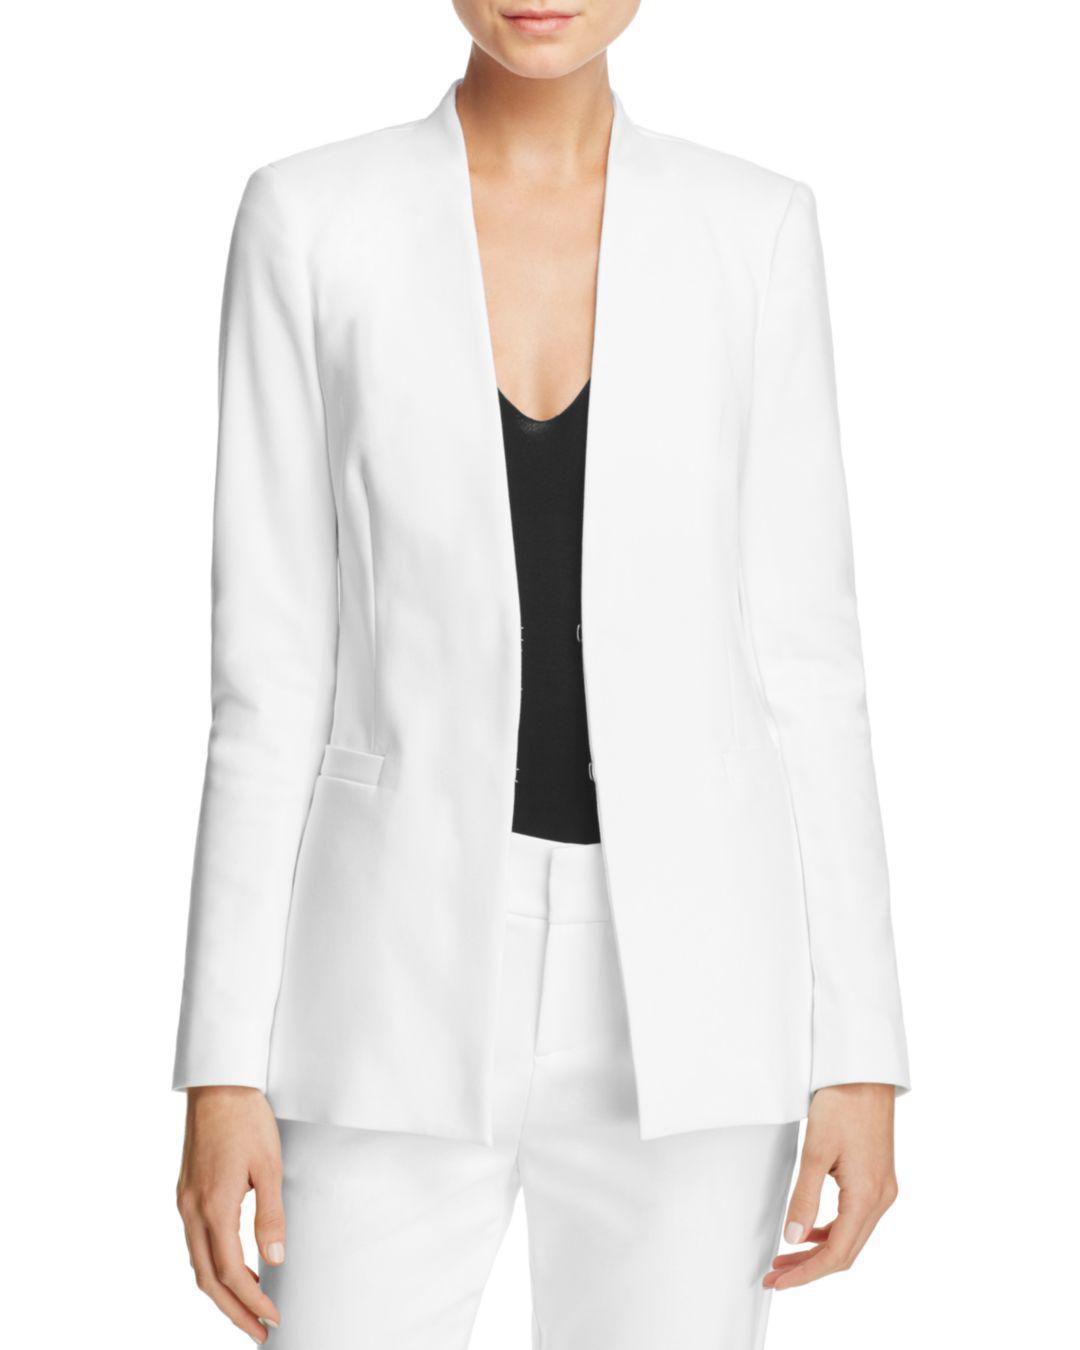 abbb50f2f007 Lyst - Alice + Olivia Alice + Olivia Jerri Tailored Blazer in White